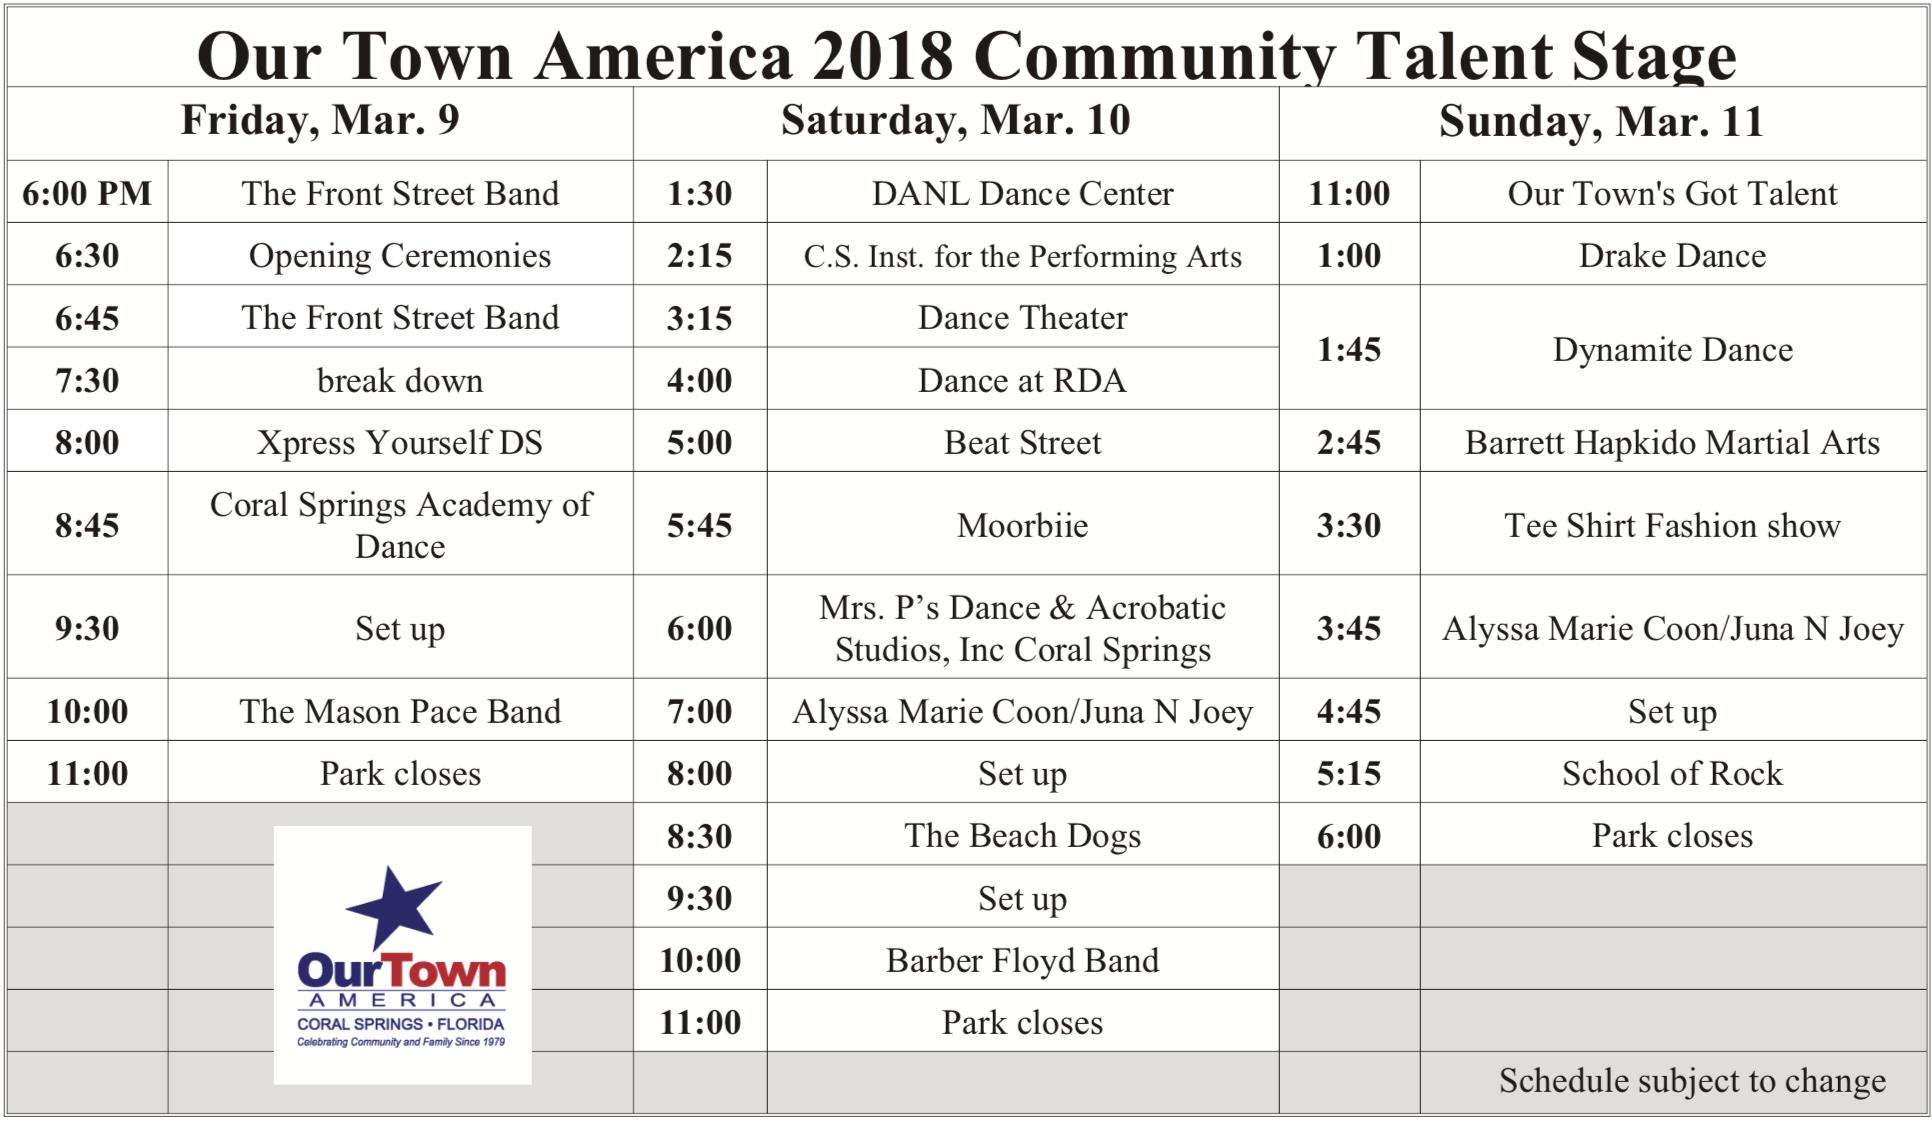 Community Talent Stage Schedule 2018